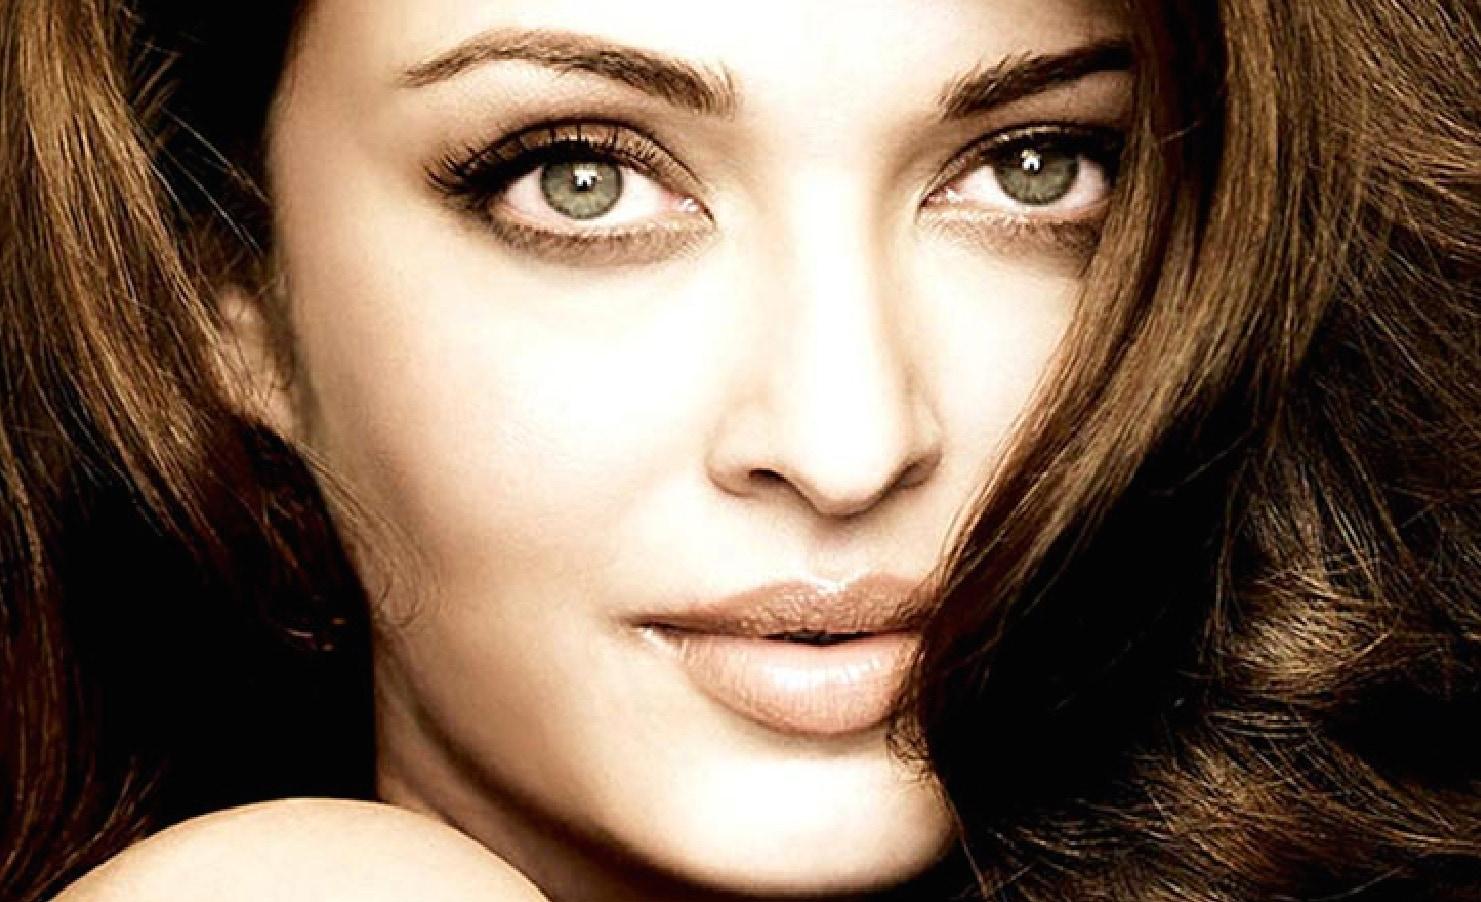 Aishwarya Rai Bachchan's Eyes: Real Colour? Contact Lenses?